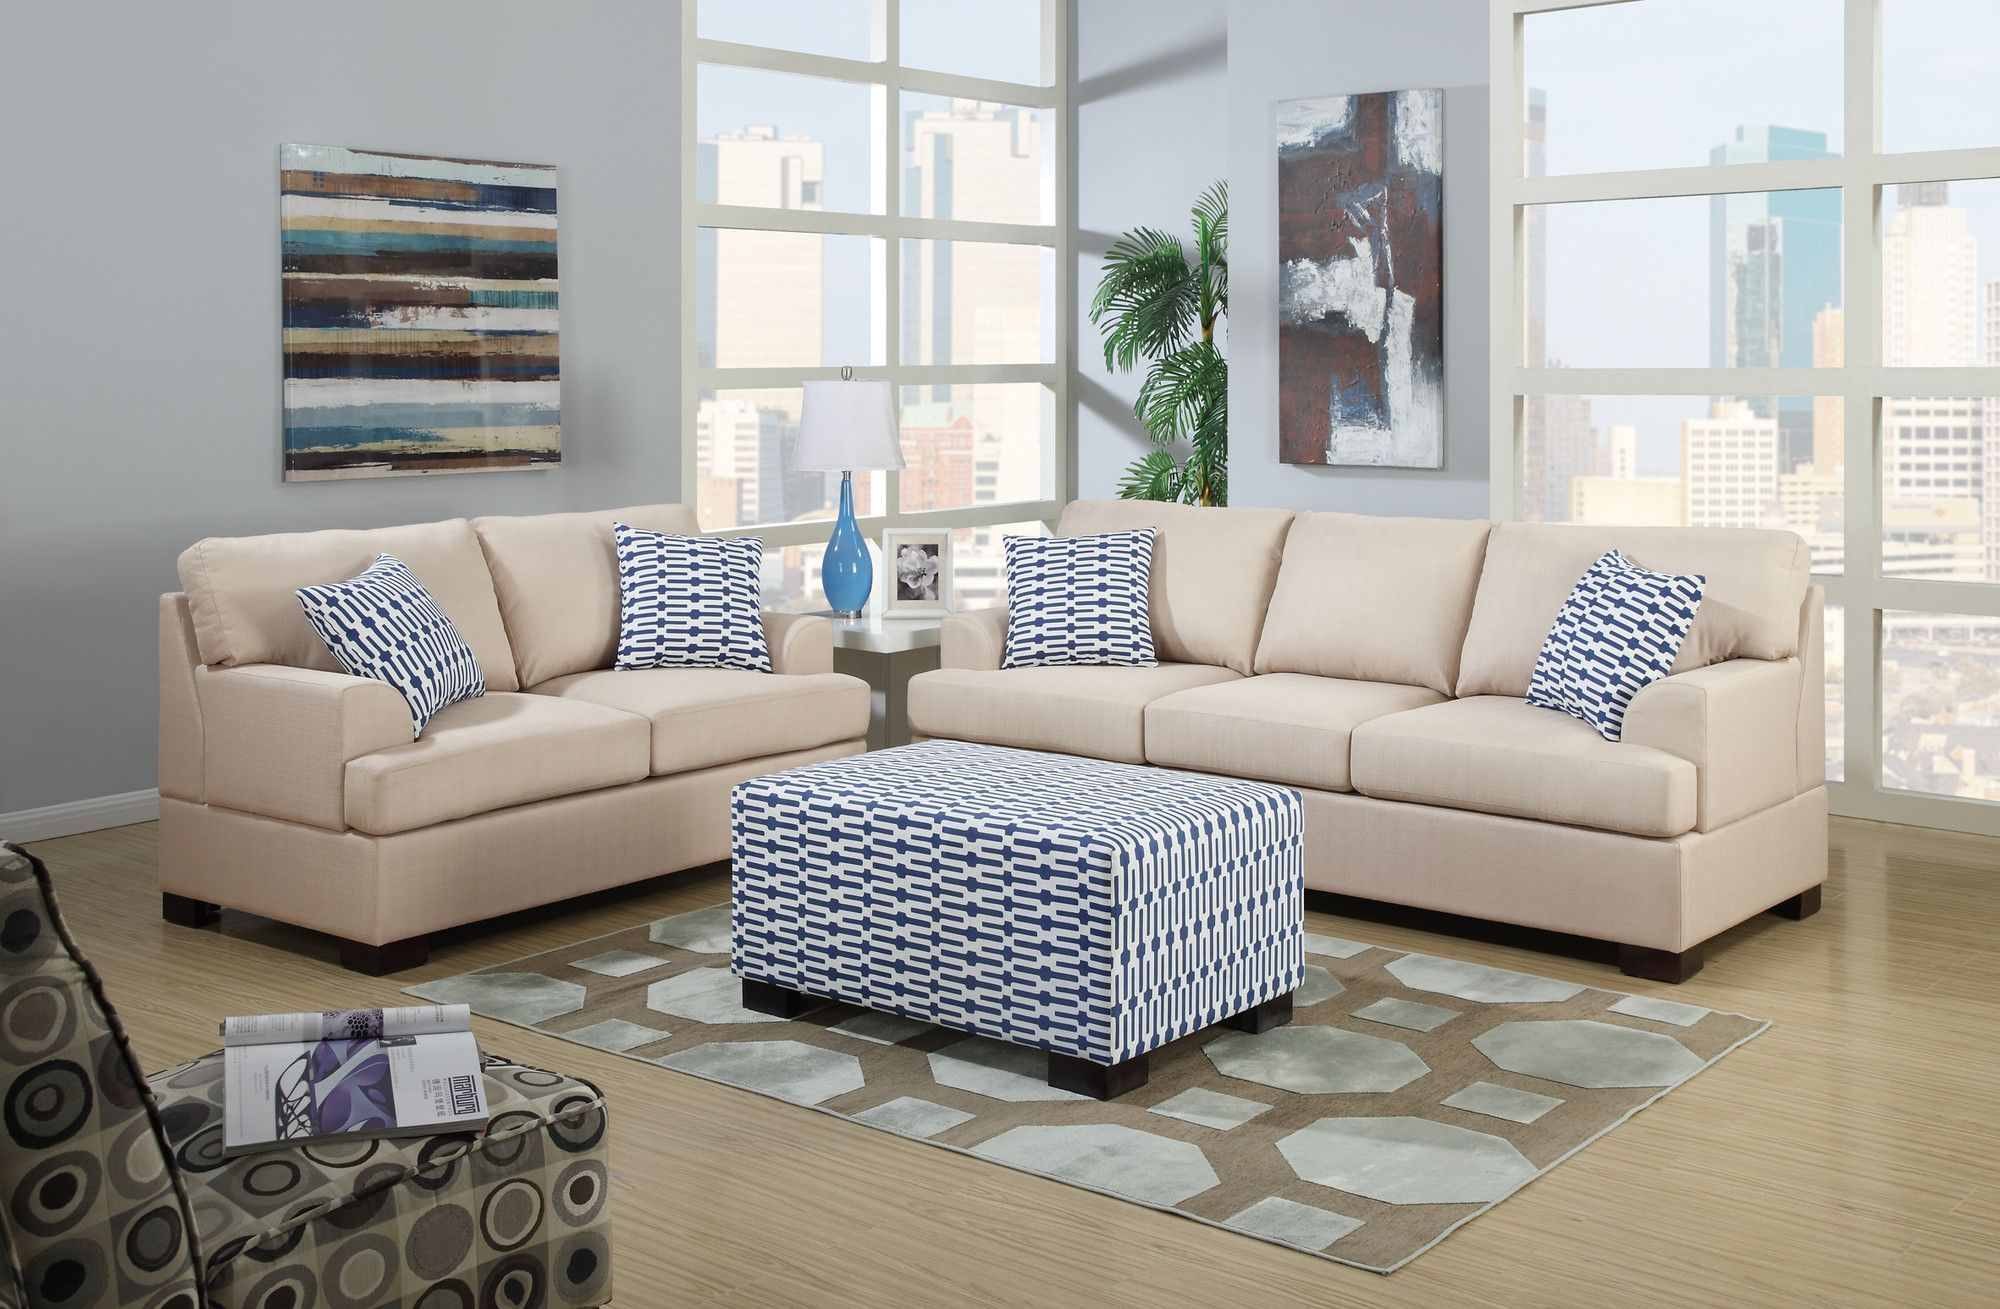 Offerman 2 Piece Living Room Set Sofa, loveseat set